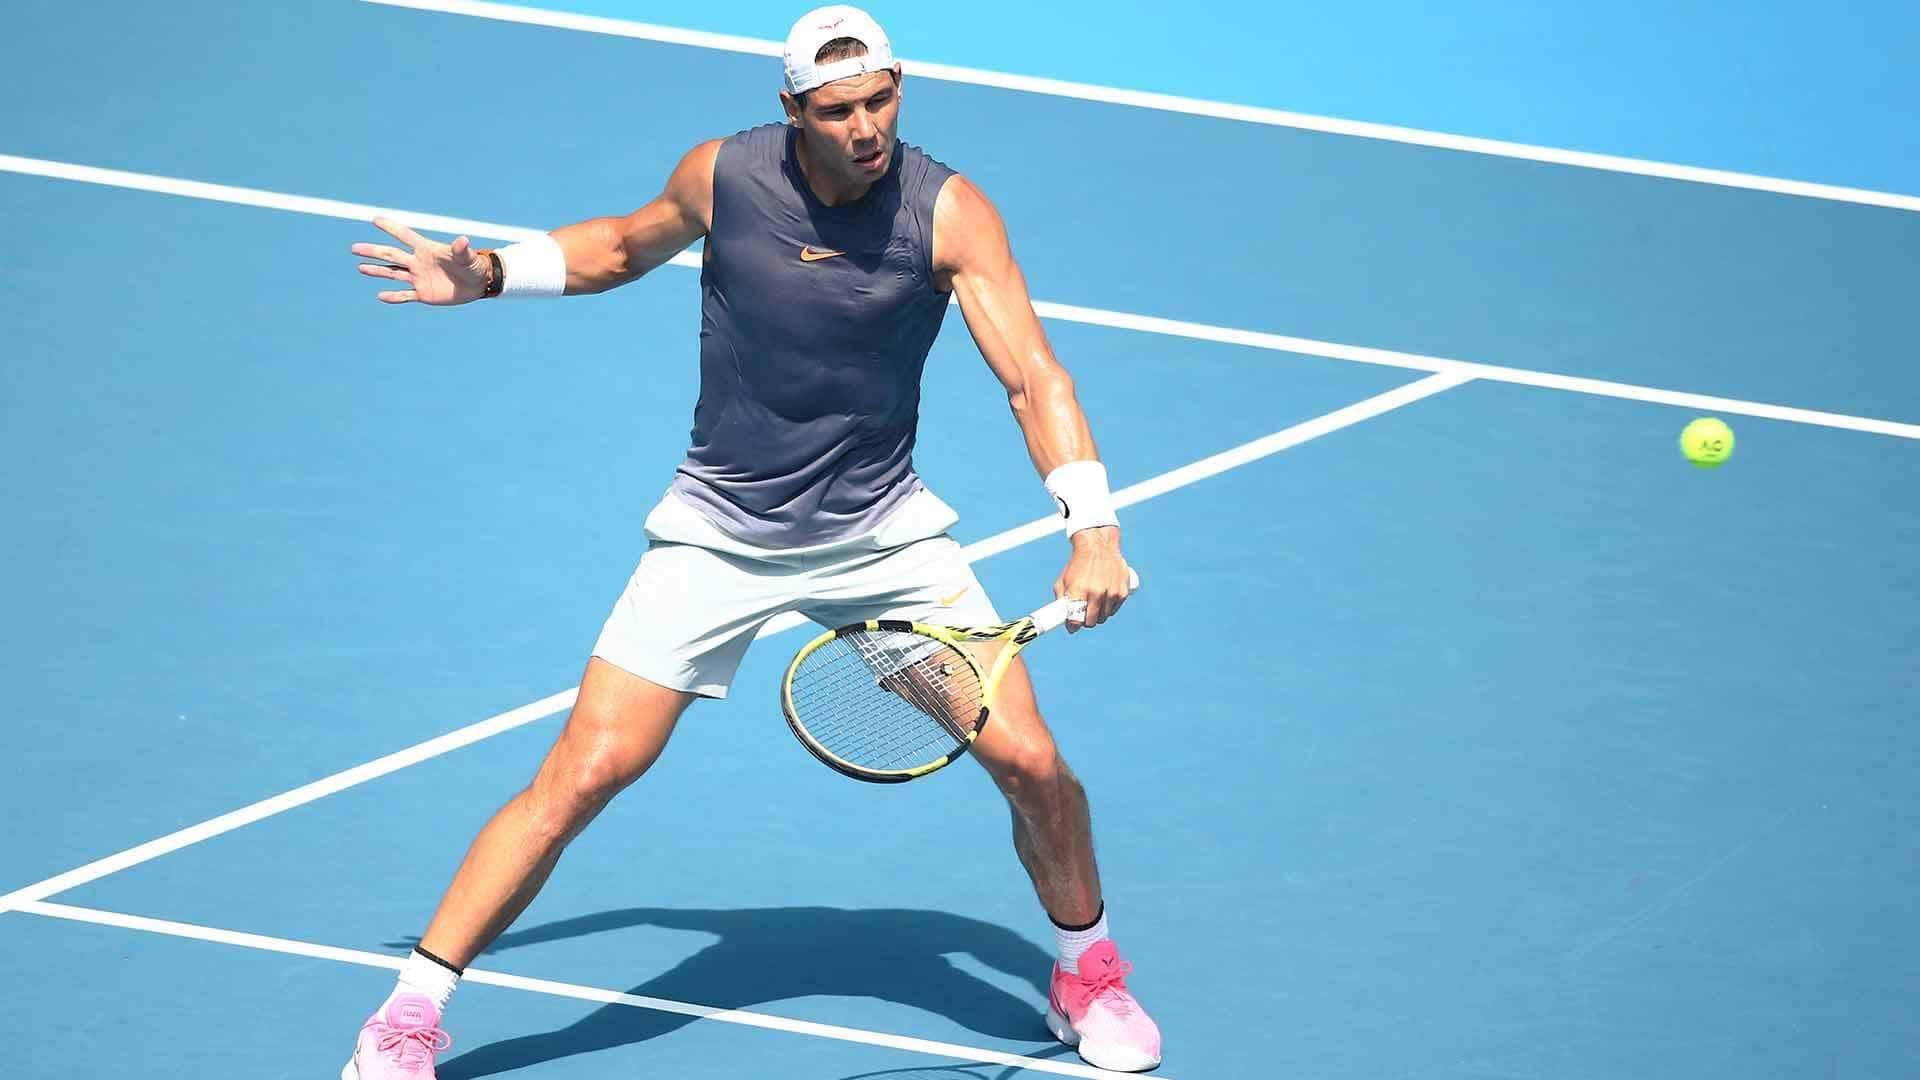 Rafael Nadal Why Life S Joys Mean More Than Titles Atp Tour Tennis